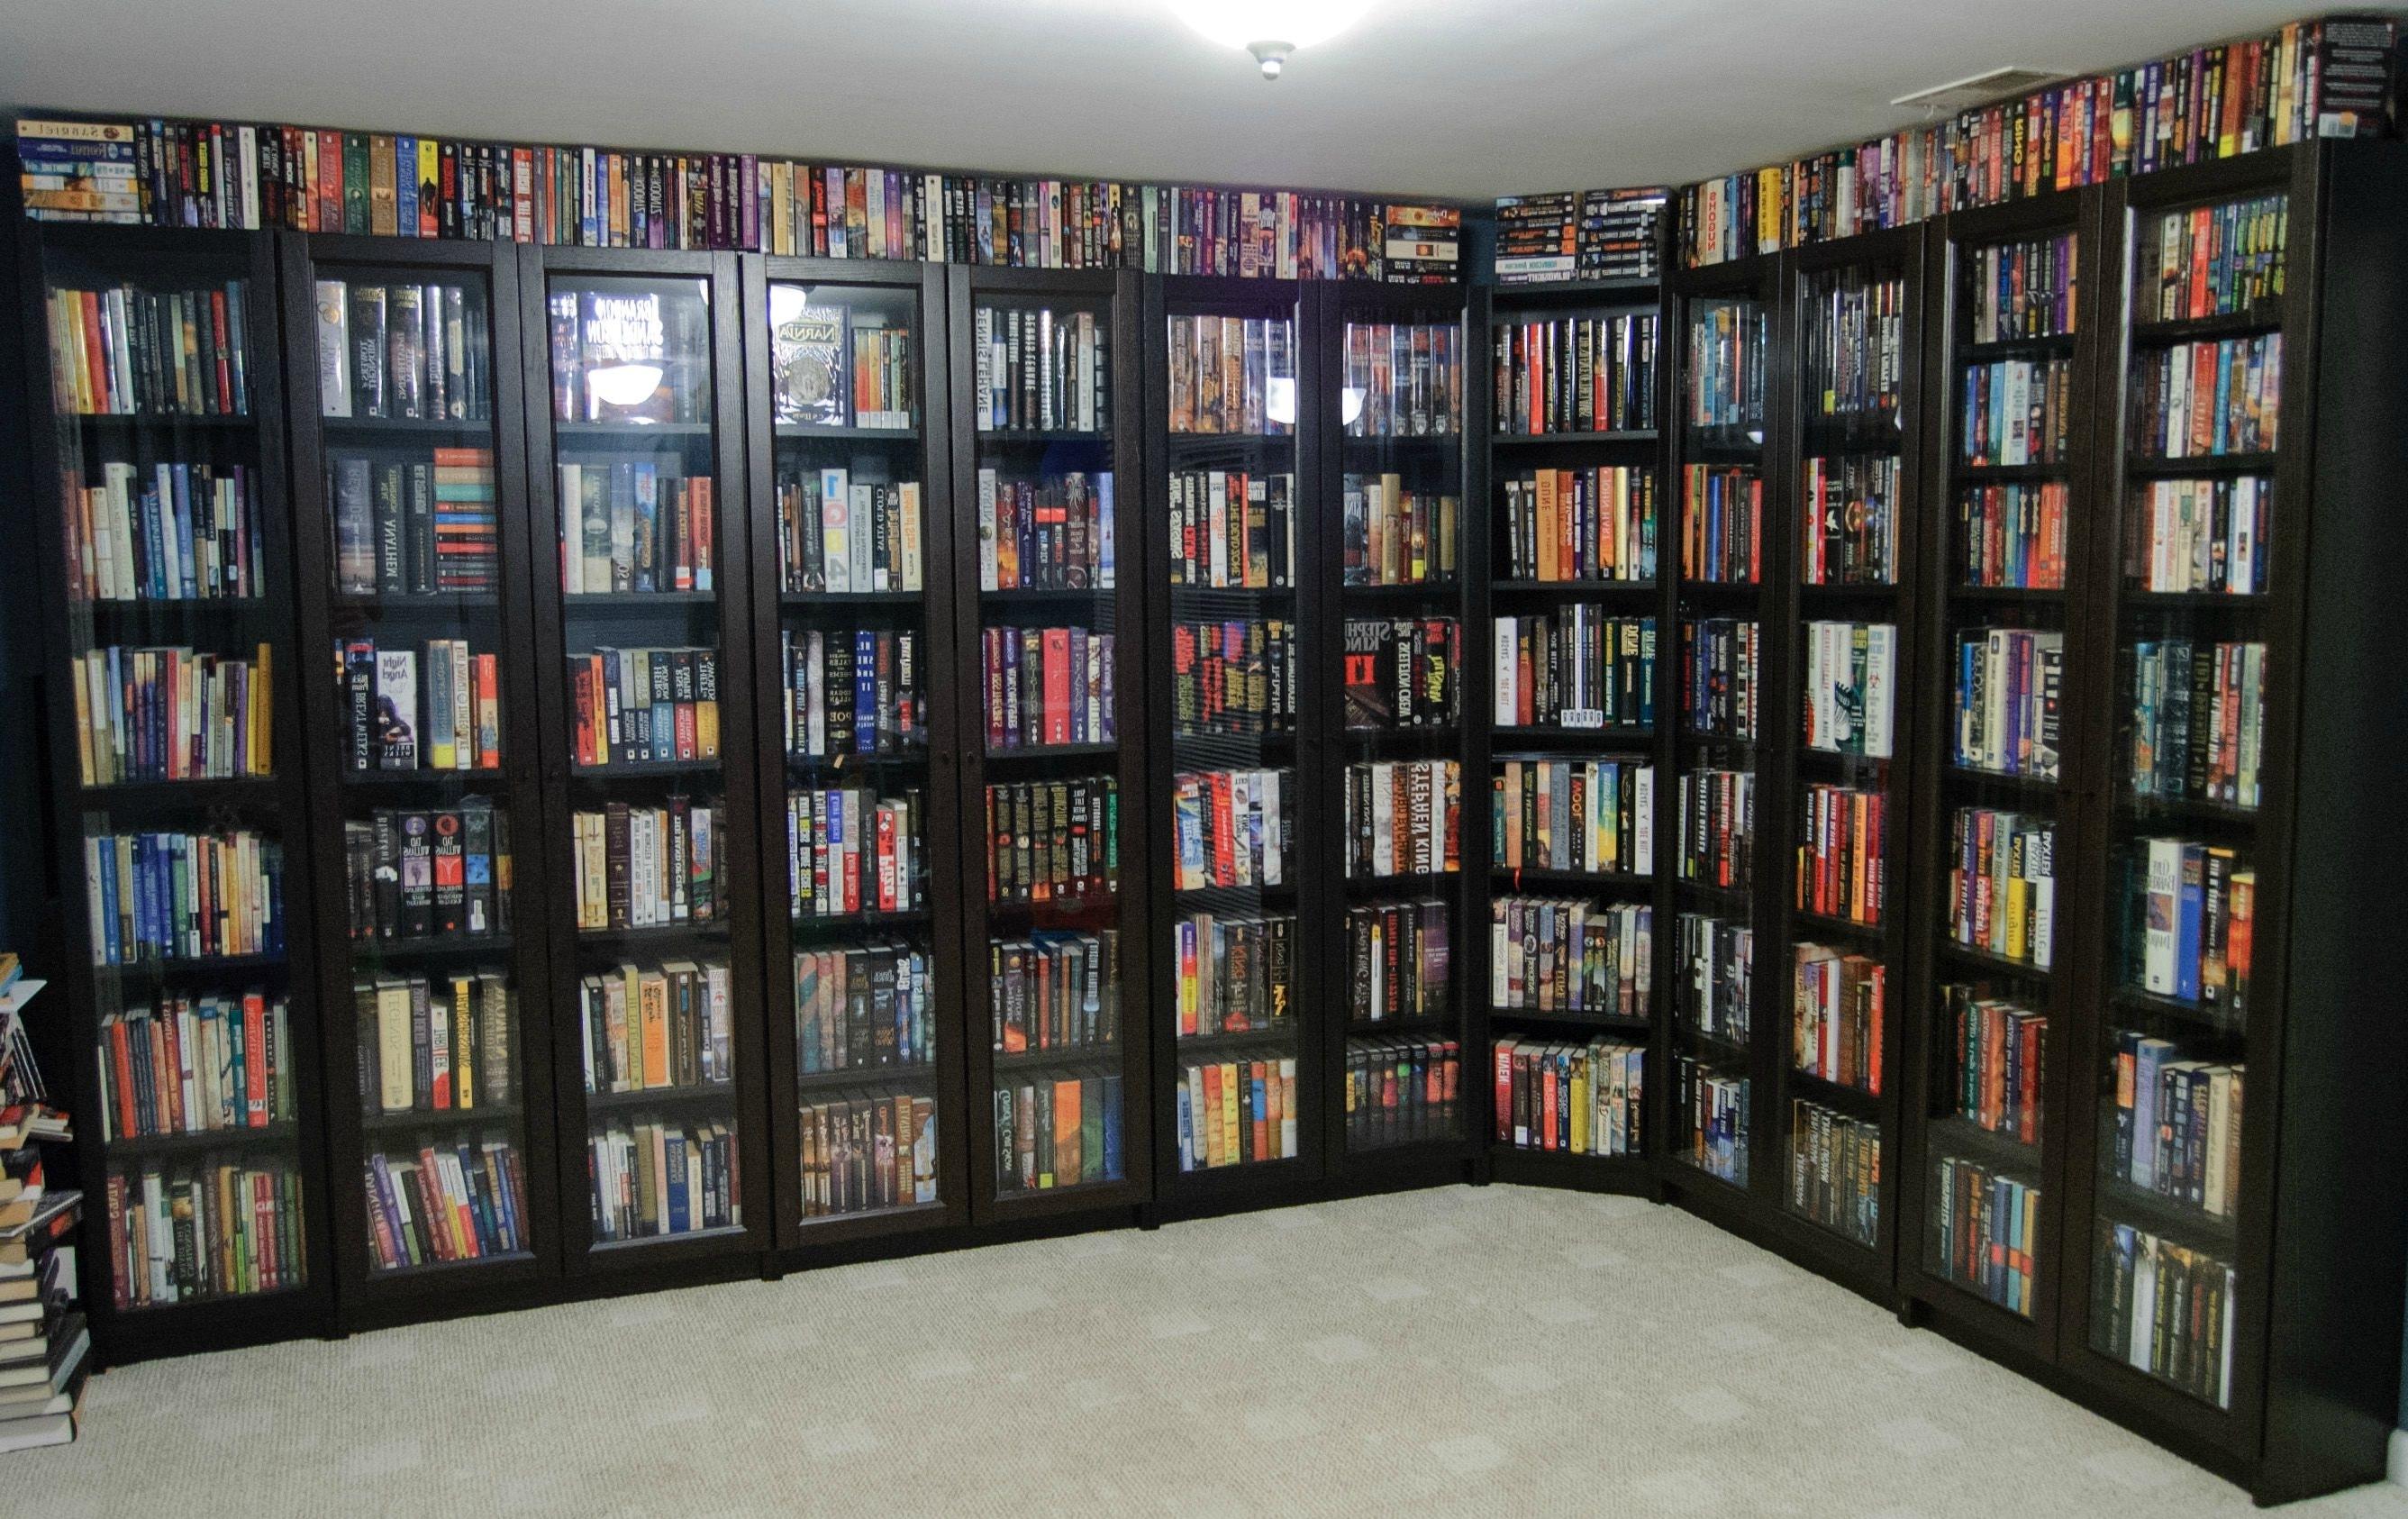 Craigslist Bookshelf Atlanta Tags : Bookshelf Craigslist Bookshelf Pertaining To Well Known Craigslist Bookcases (View 8 of 15)